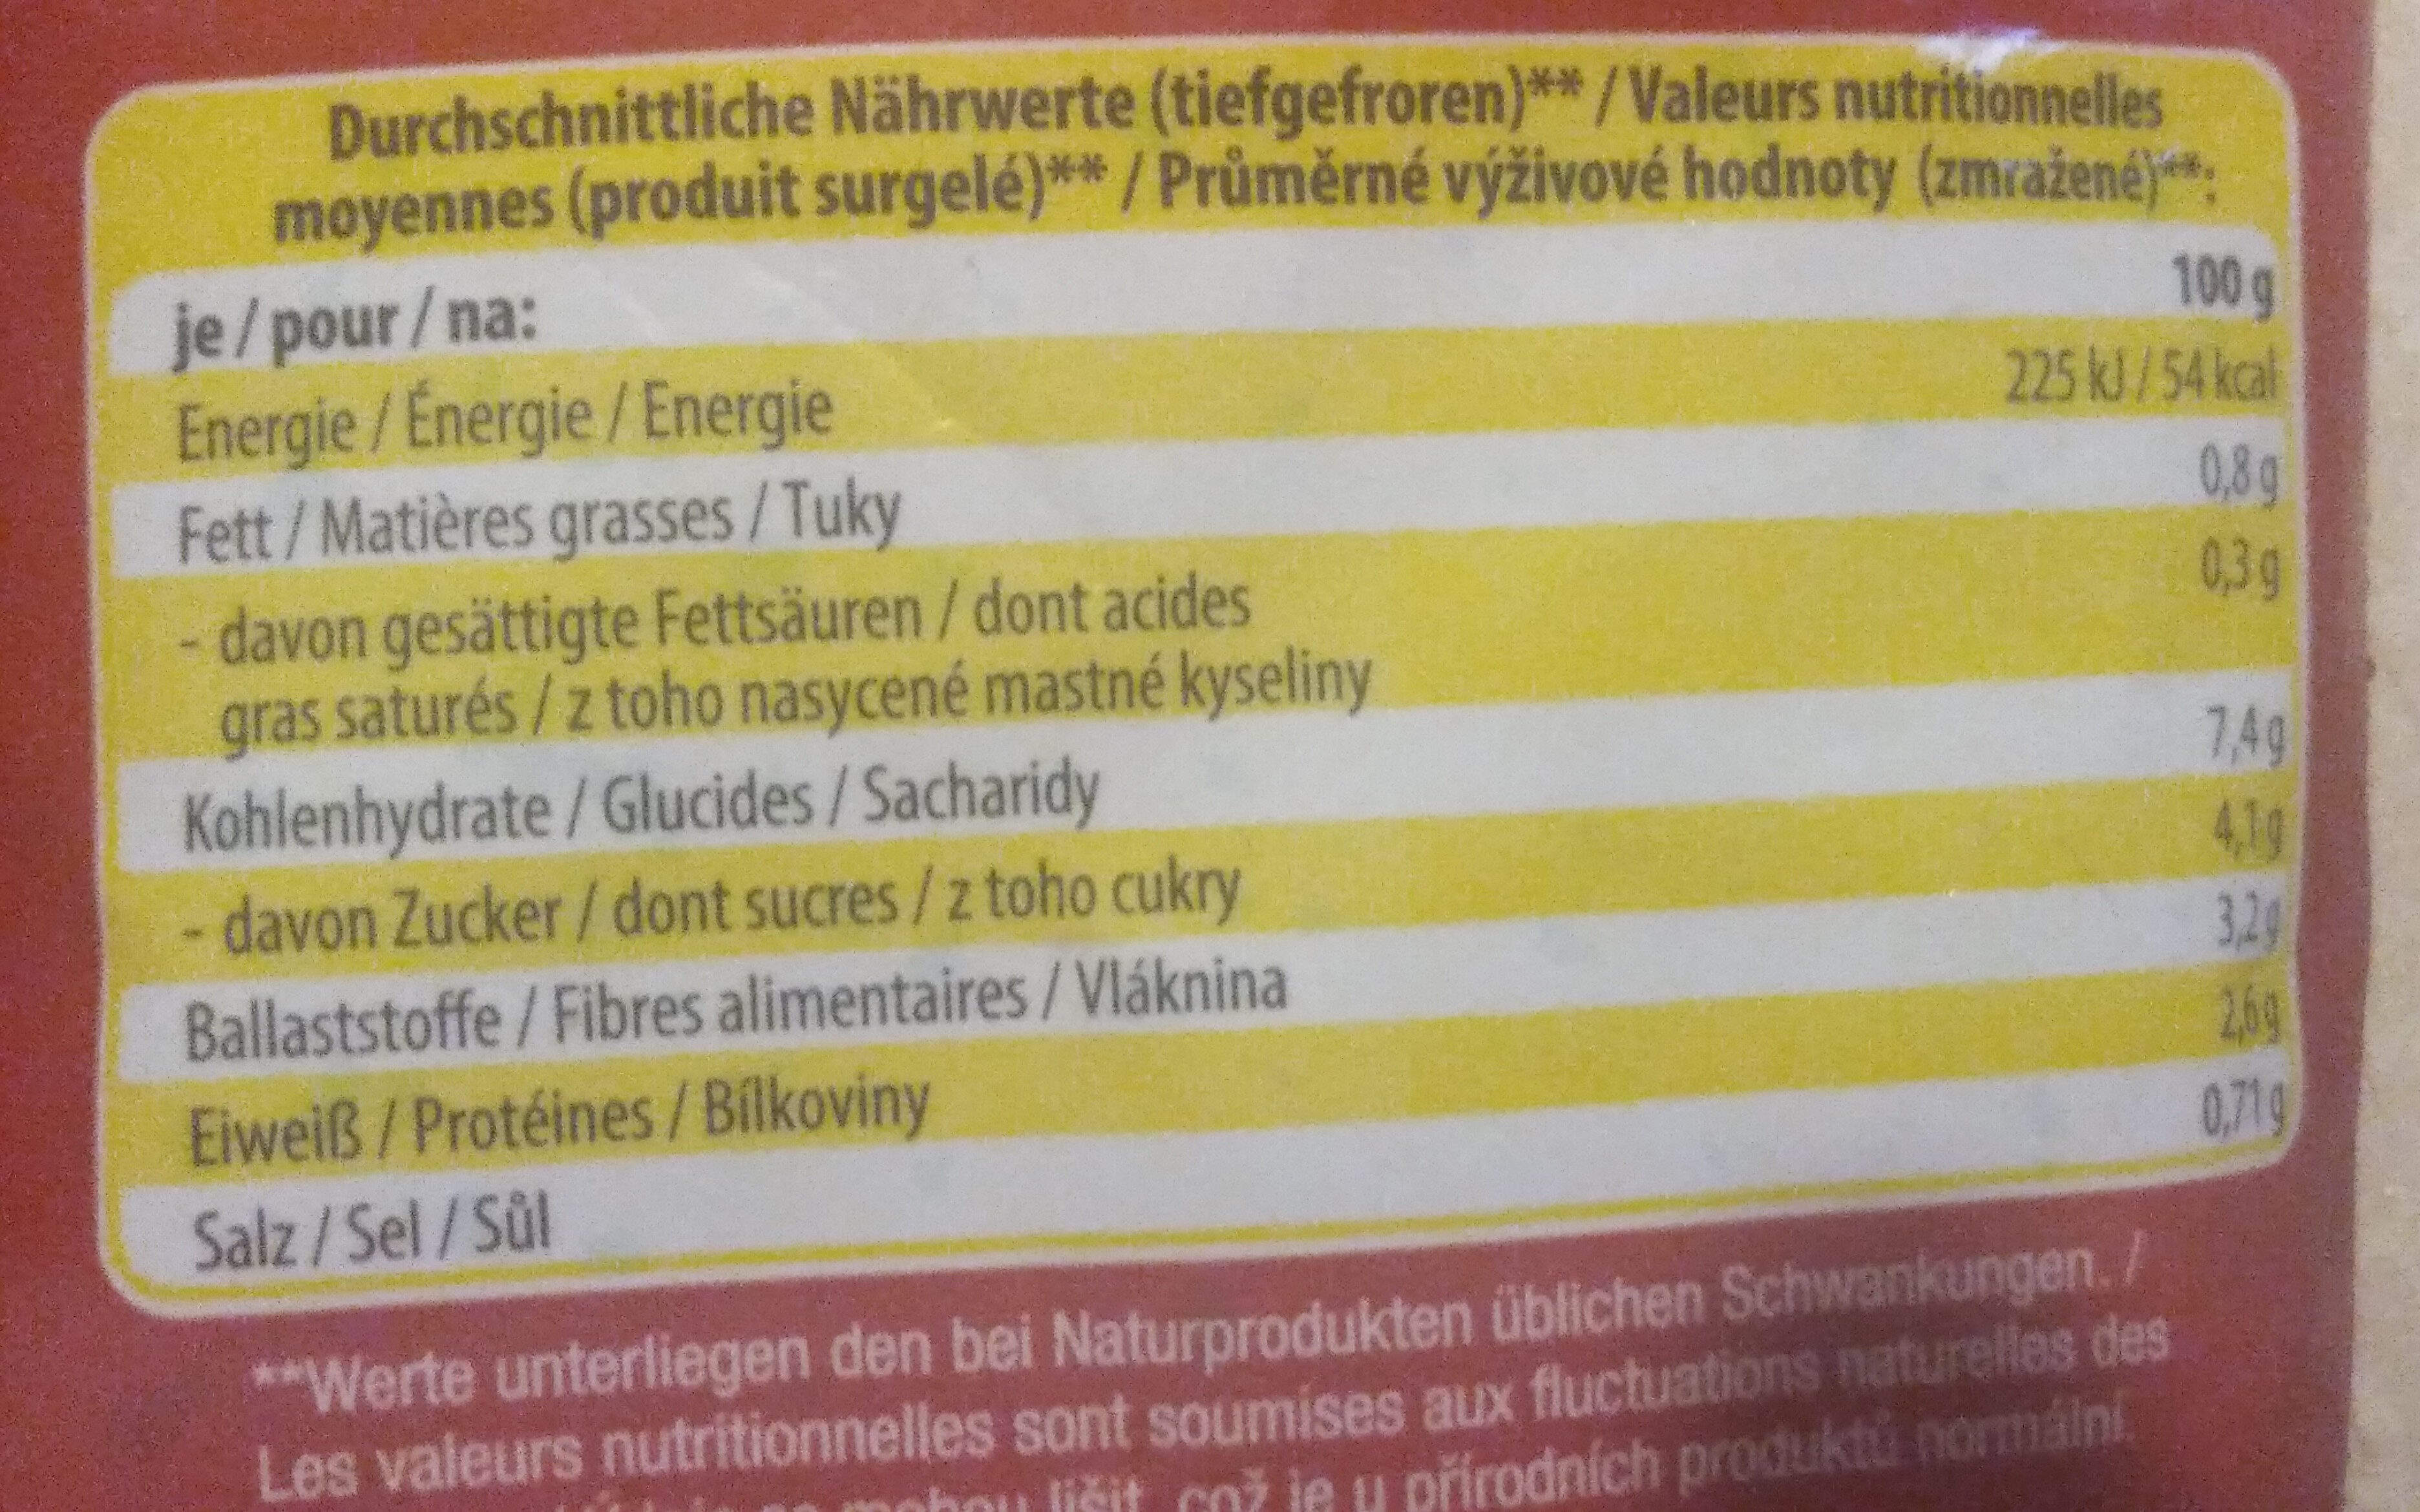 Pfannengemüse Feinschmecker Art - Voedigswaarden